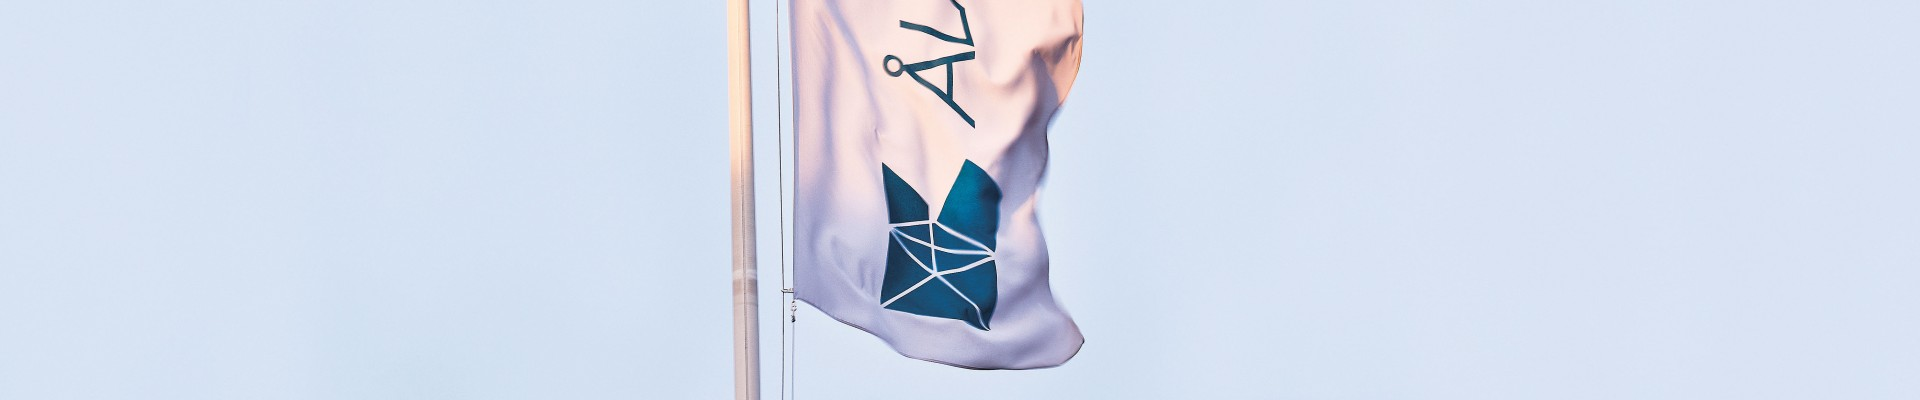 Åland Post flag